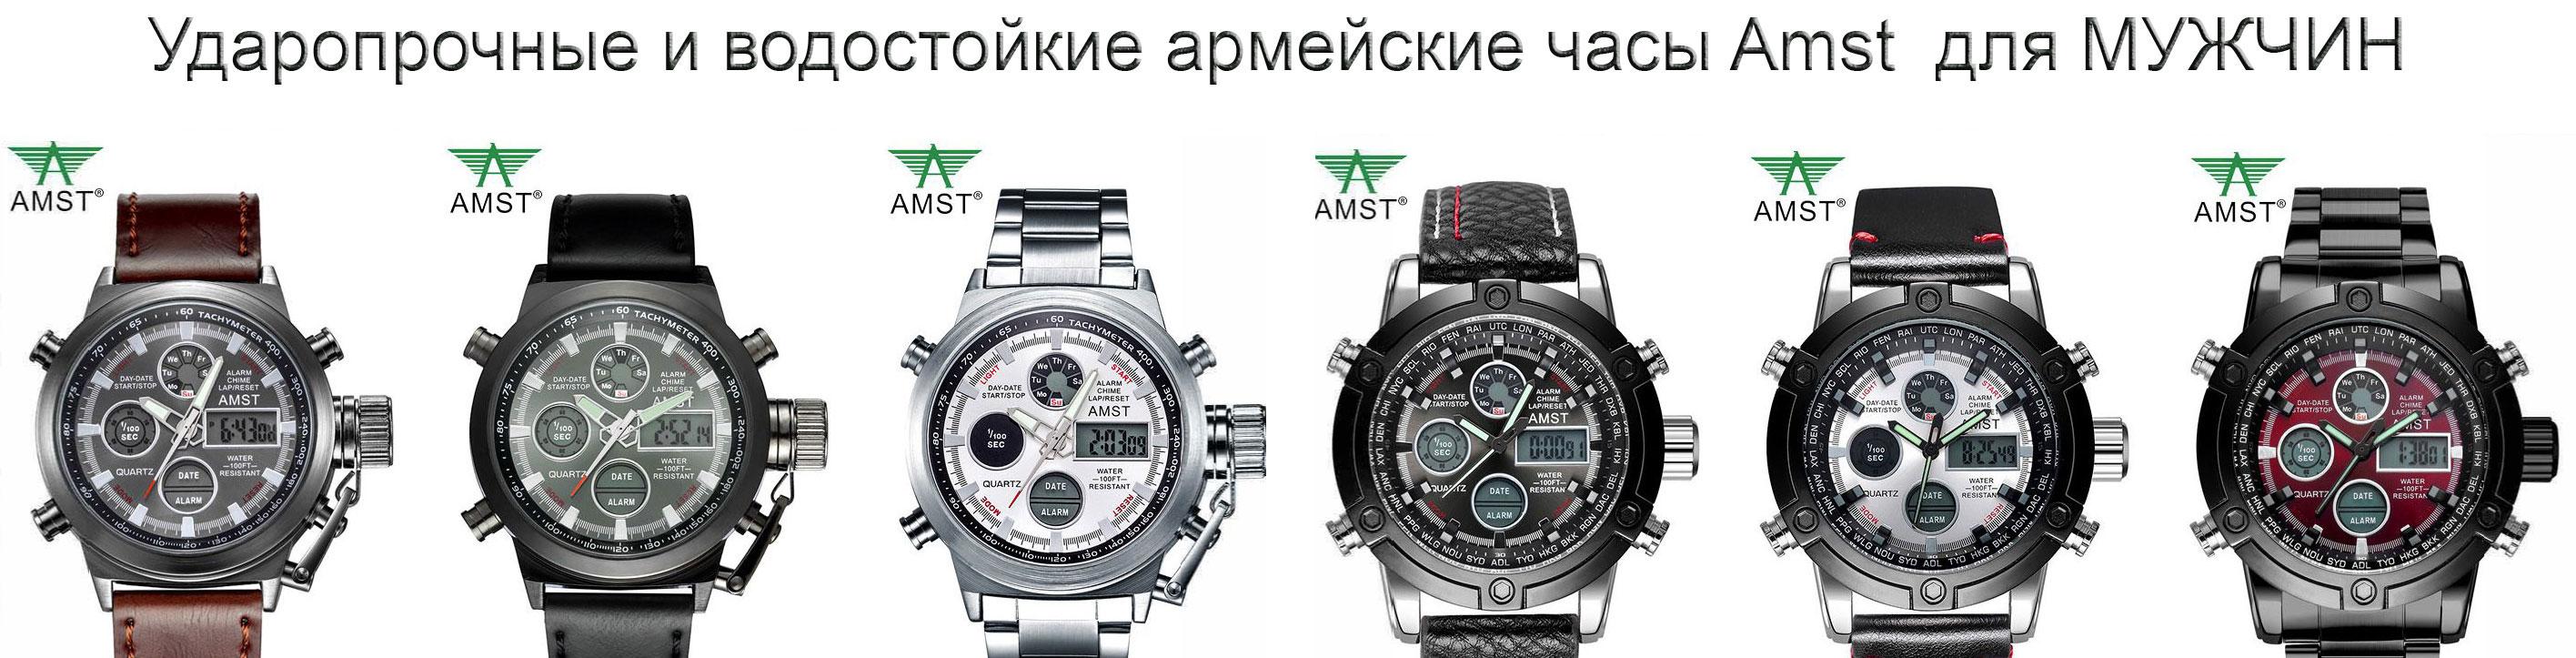 армейские часы amst